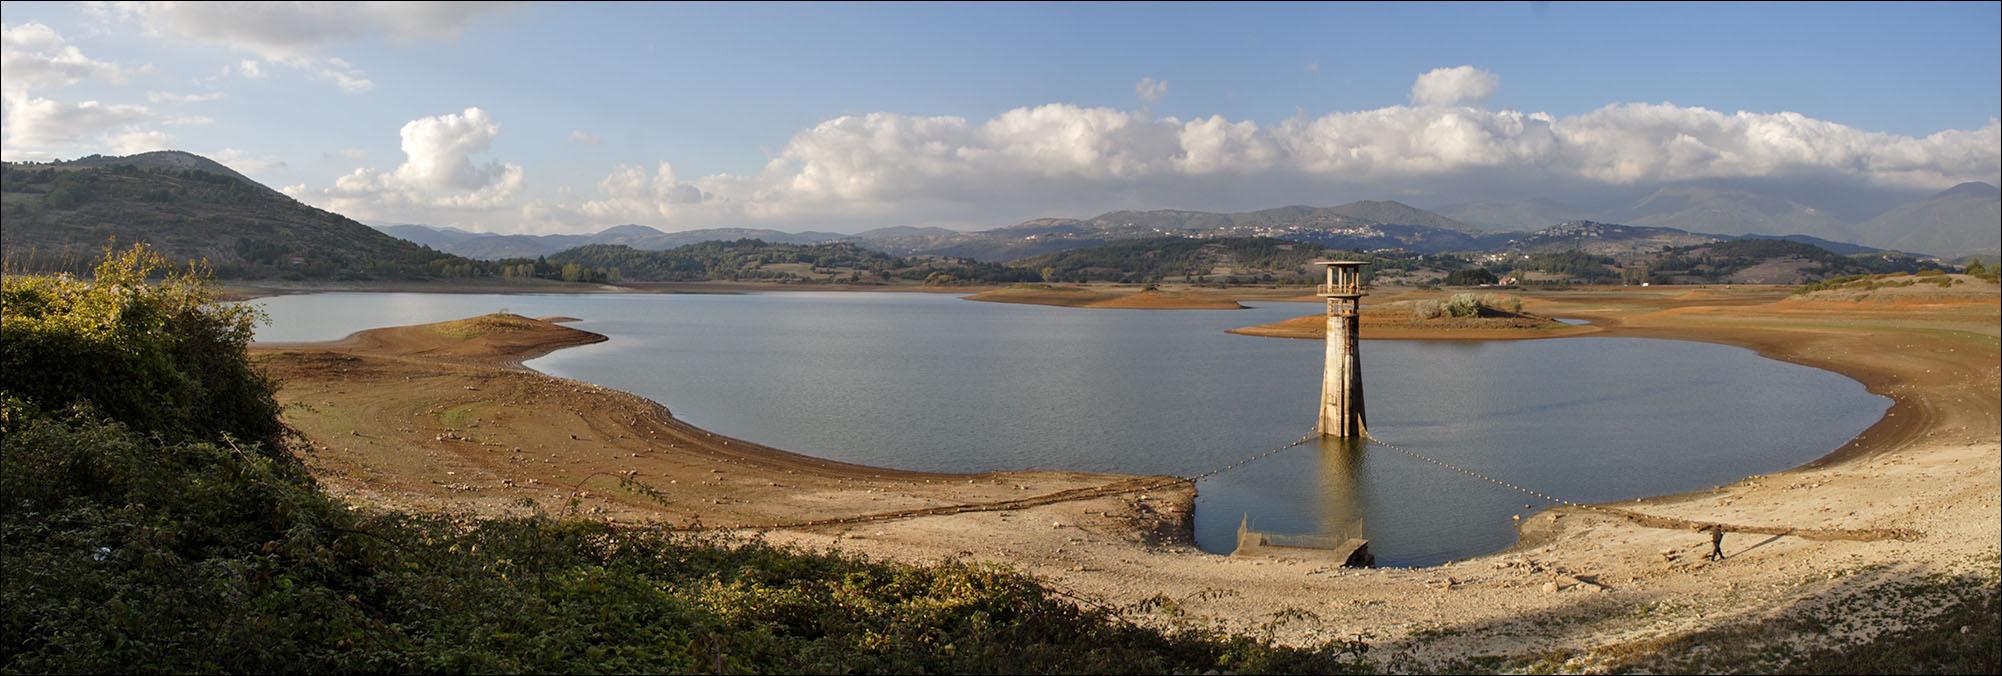 Canterno Panoramica 2011_10_18.jpg